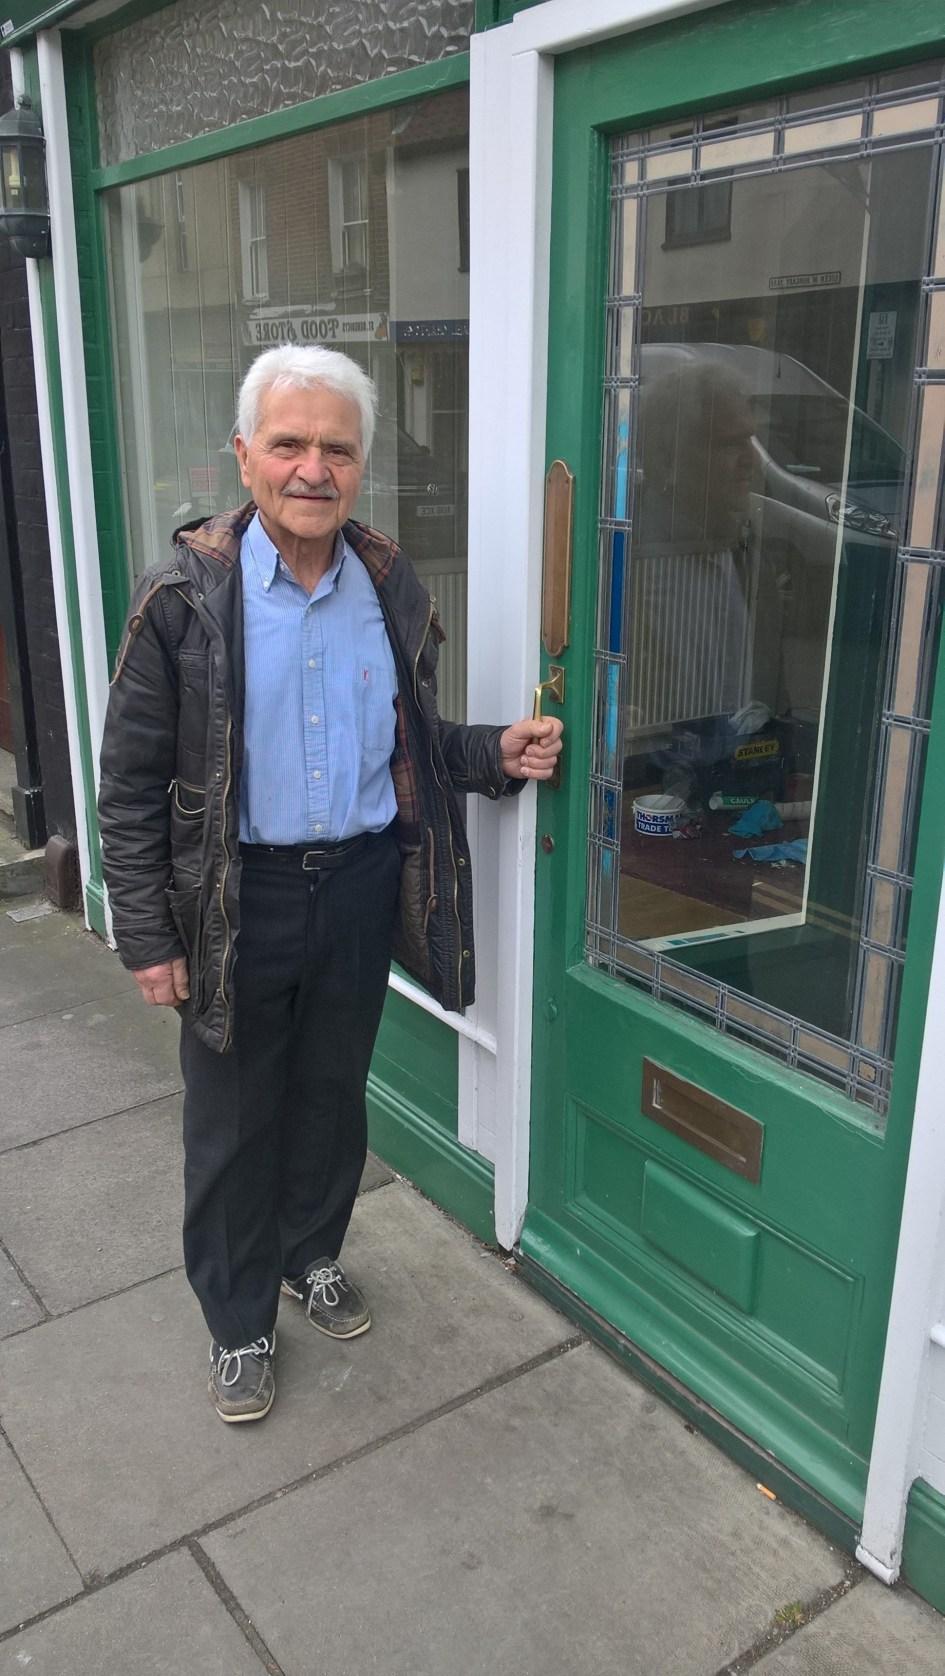 Umberto's restaurant in Norwich closes